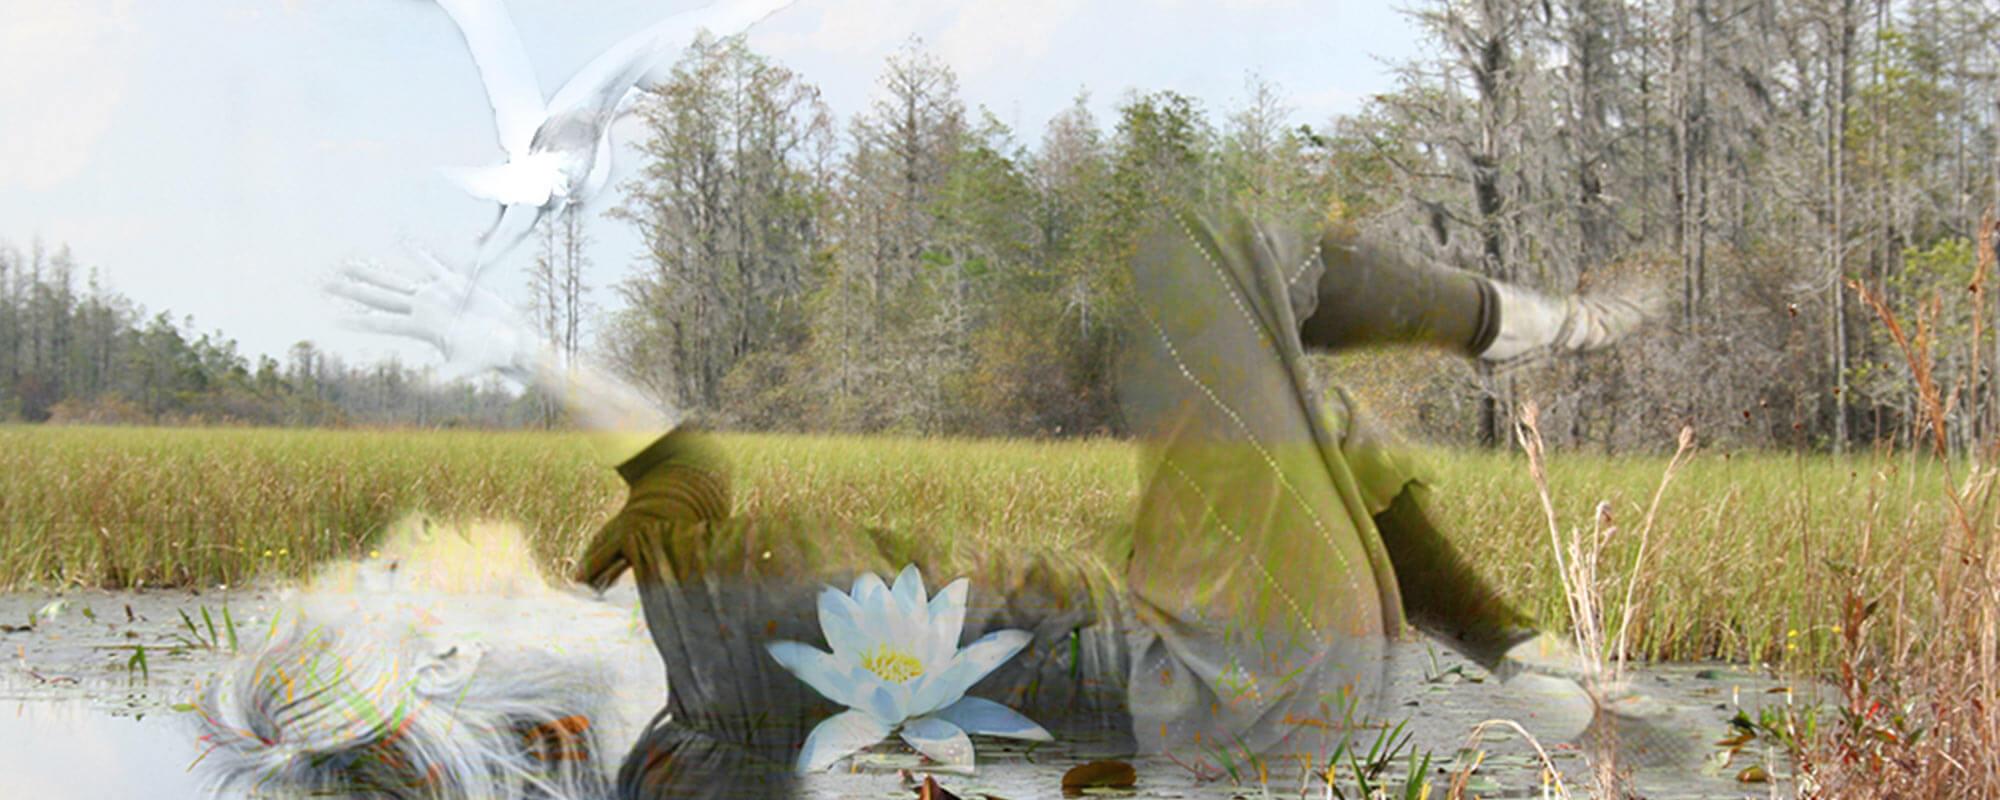 My Body, The Wetland: A Continuum Workshop